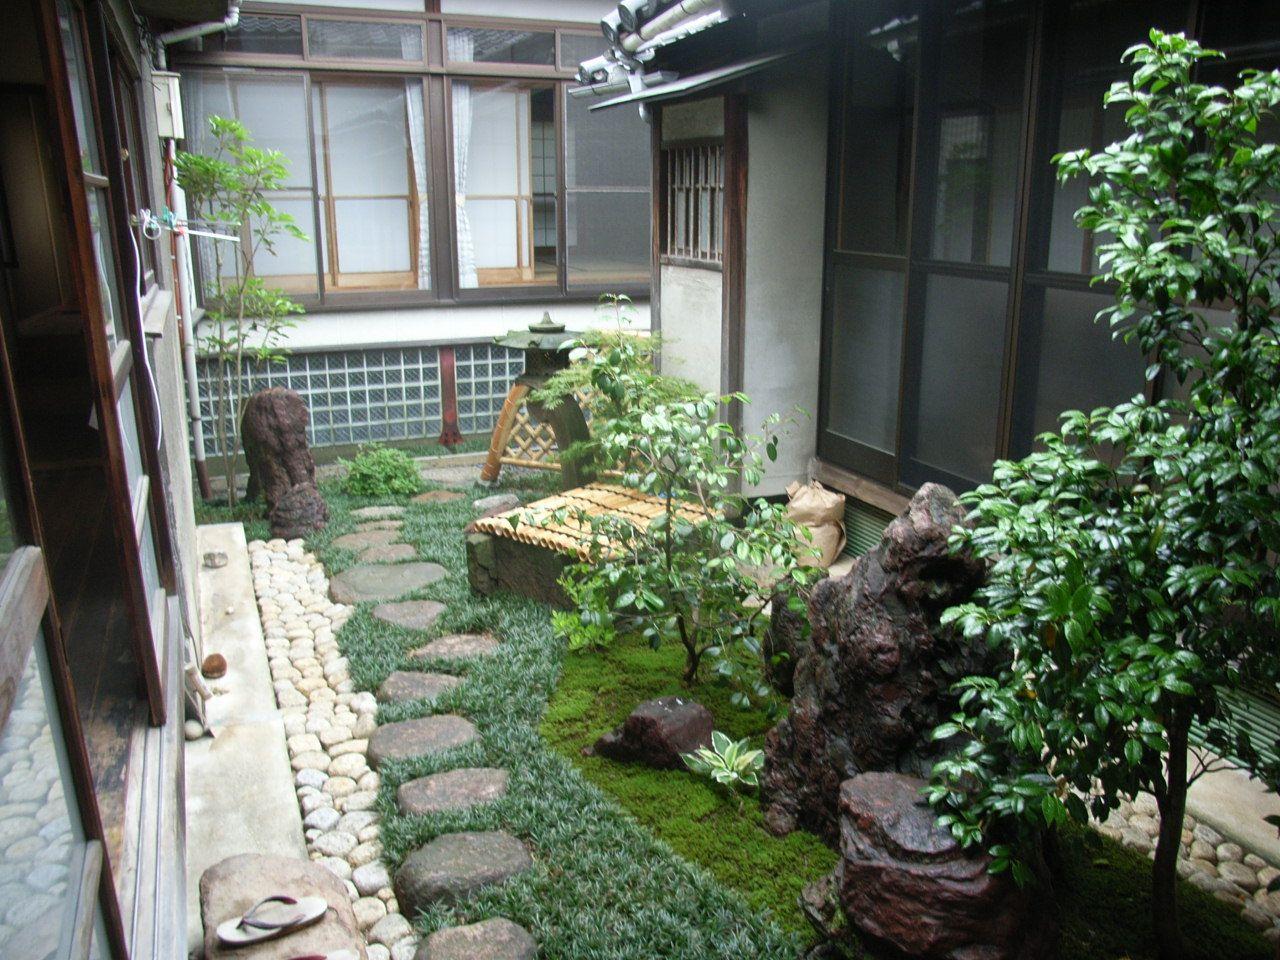 Small Space Japanese Garden 日本の石庭 日本庭園 日本庭園の設計 400 x 300